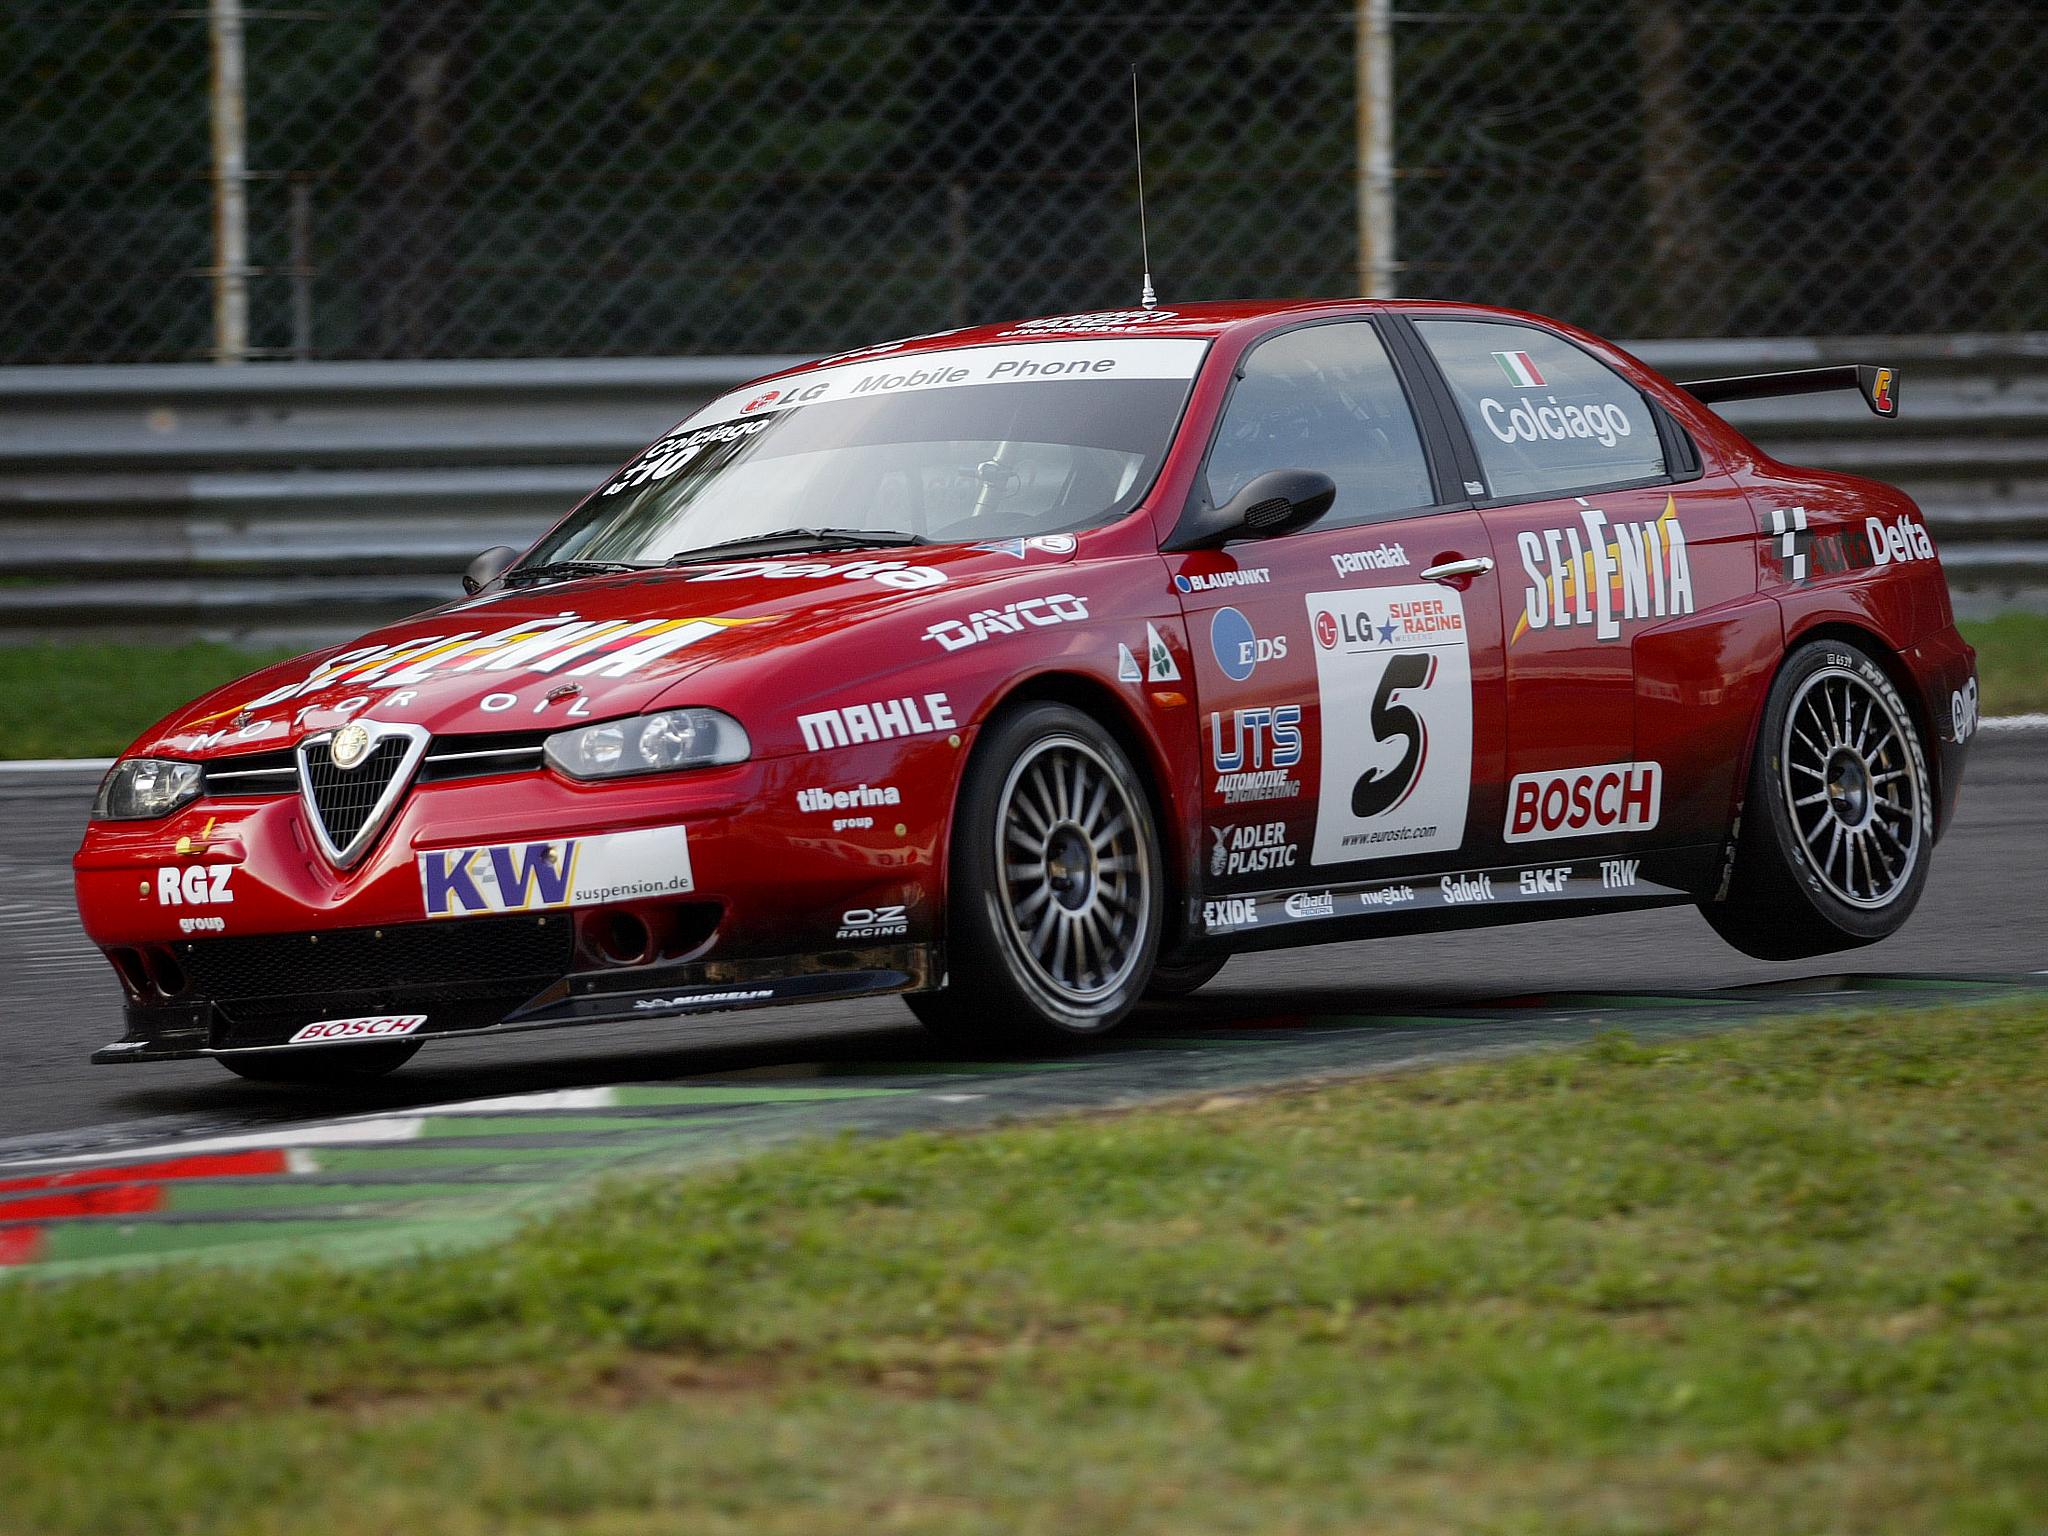 Alfa Romeo 156 Btcc Super Touring Car: 2002 Alfa Romeo 156 GTA Super-2000 SE090 Race Racing G